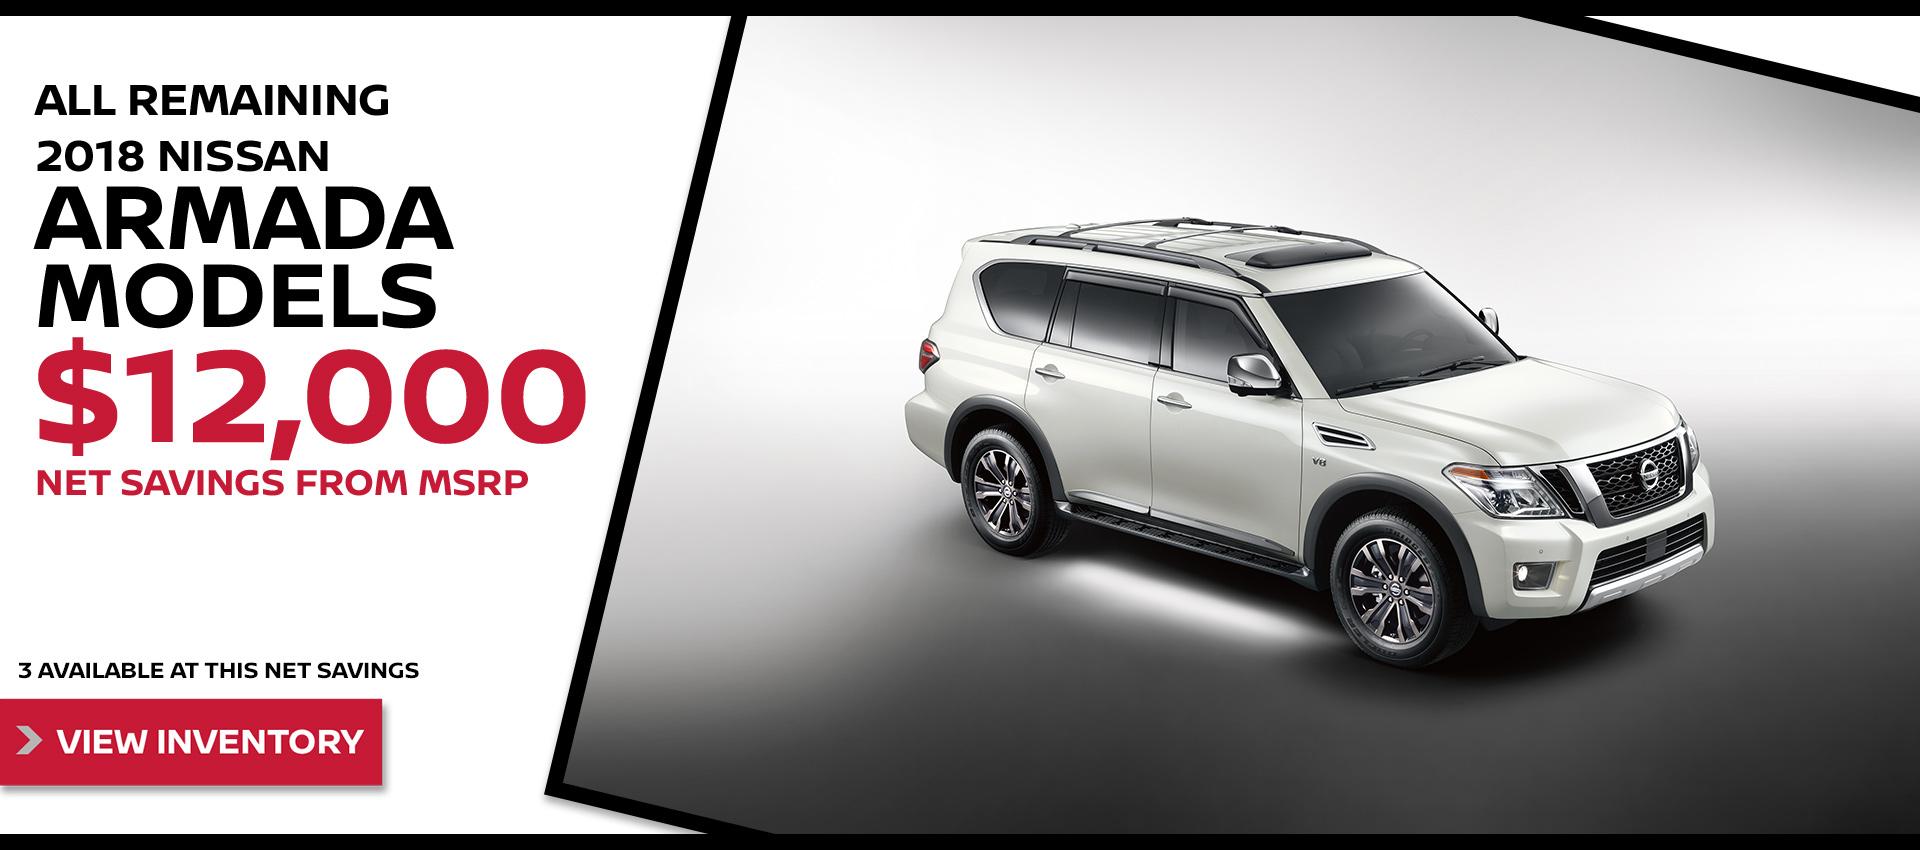 Mossy Nissan - Nissan Armada $12k OFF MSRP HP